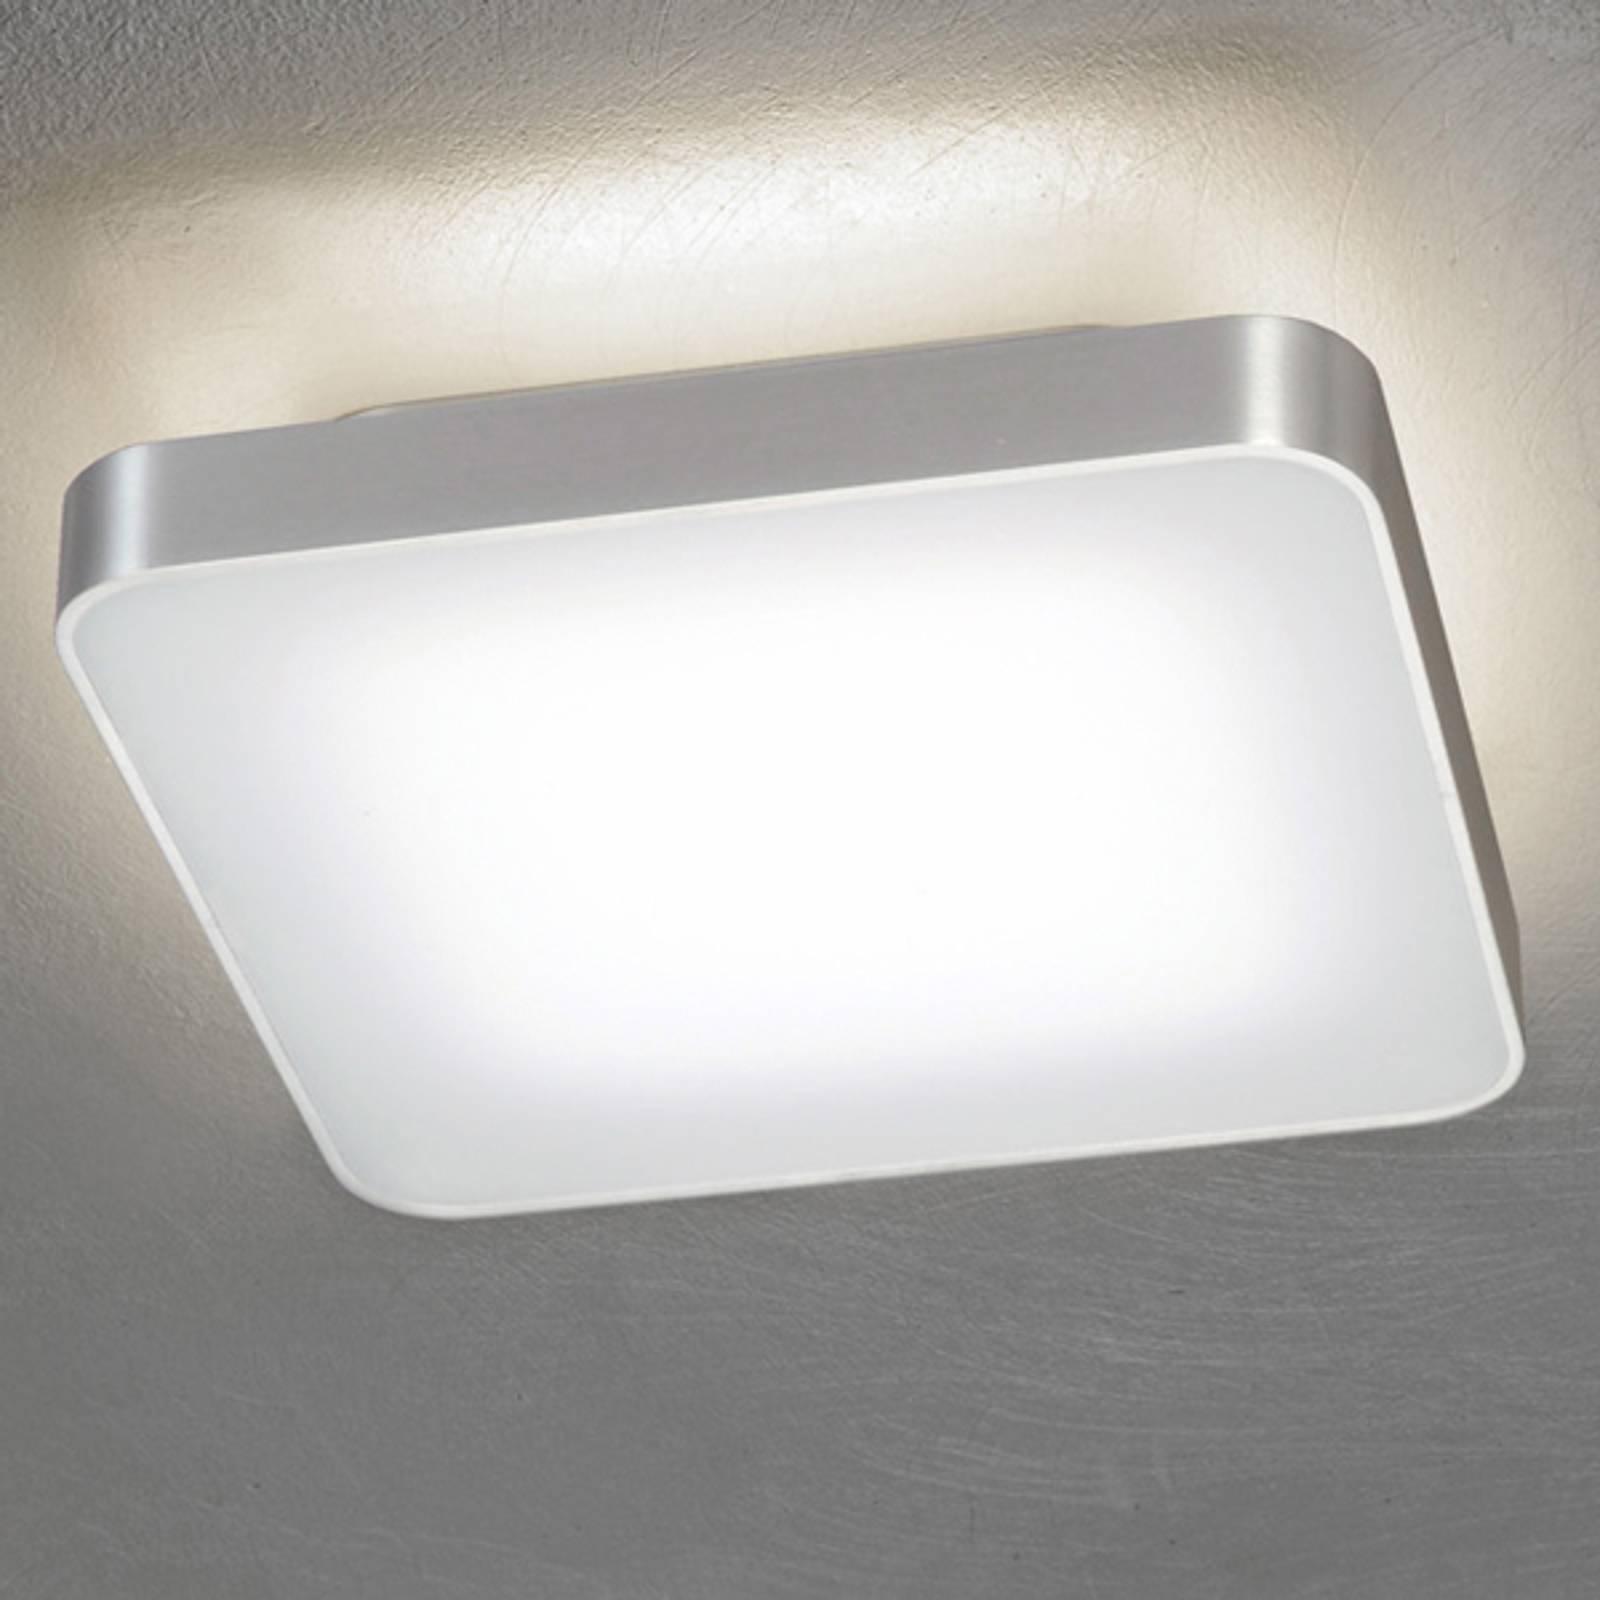 Perfetto - moderne LED plafondlamp